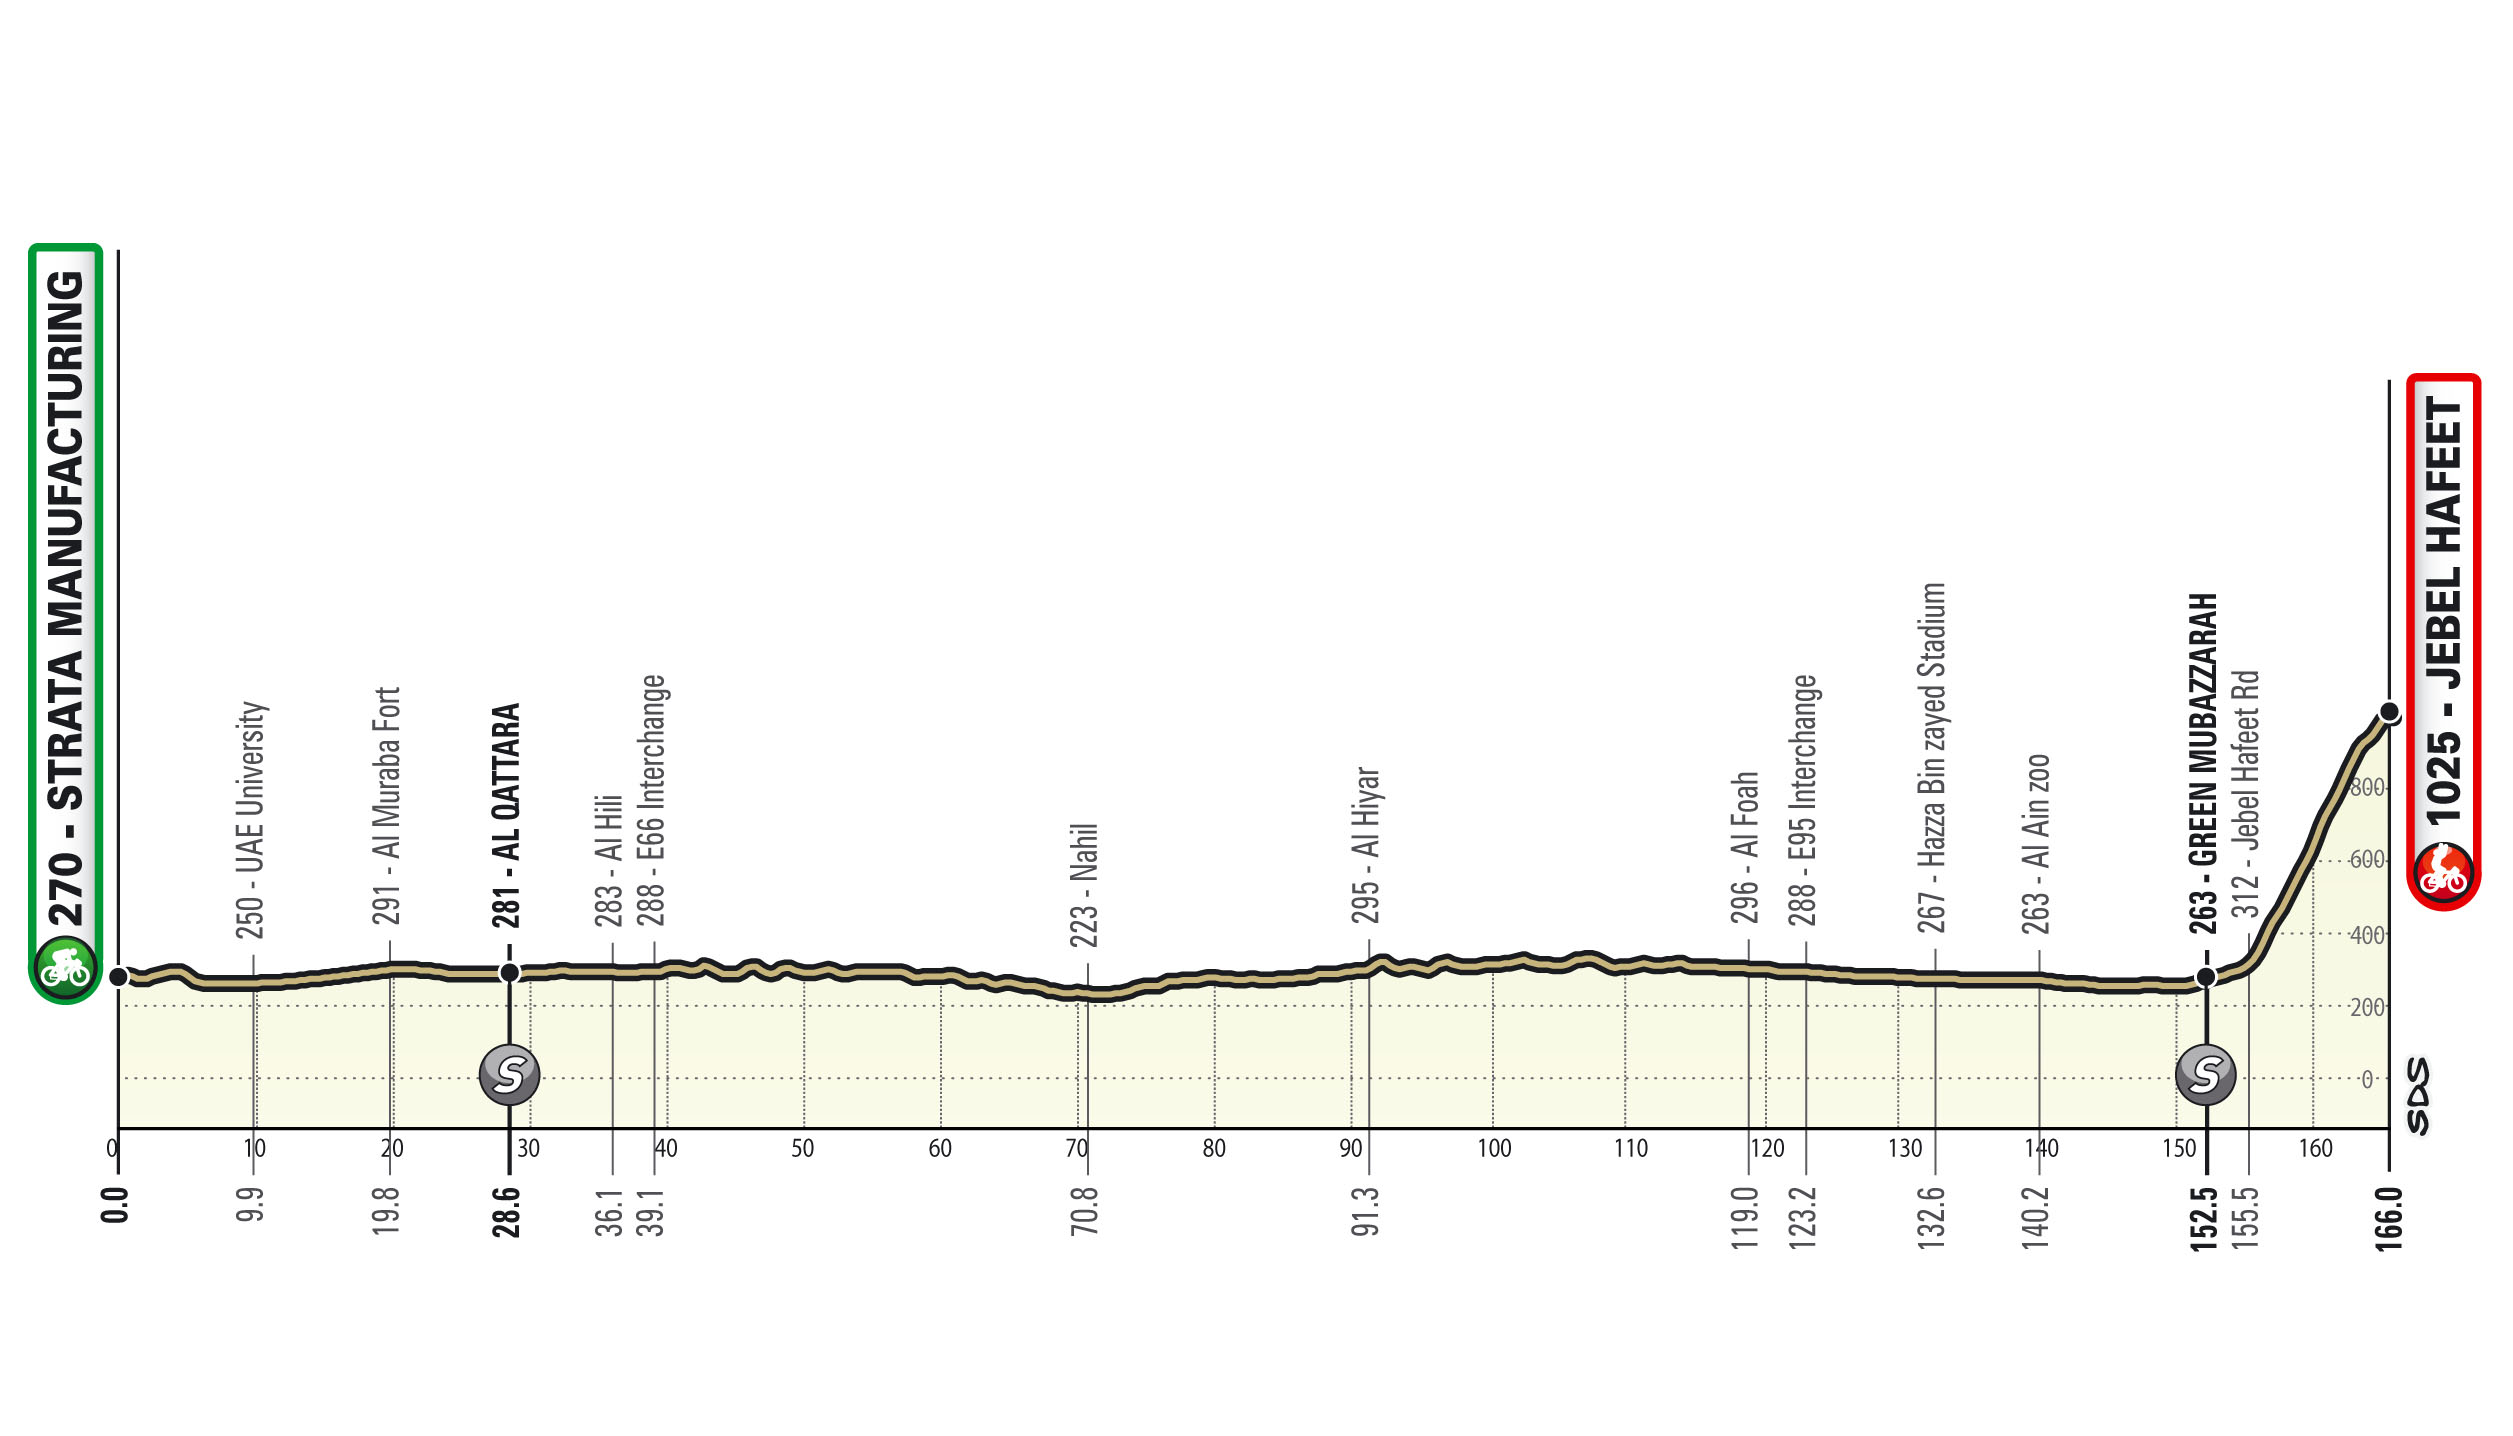 3. etapa UAE Tour 2021. zdroj: theuaetour.com